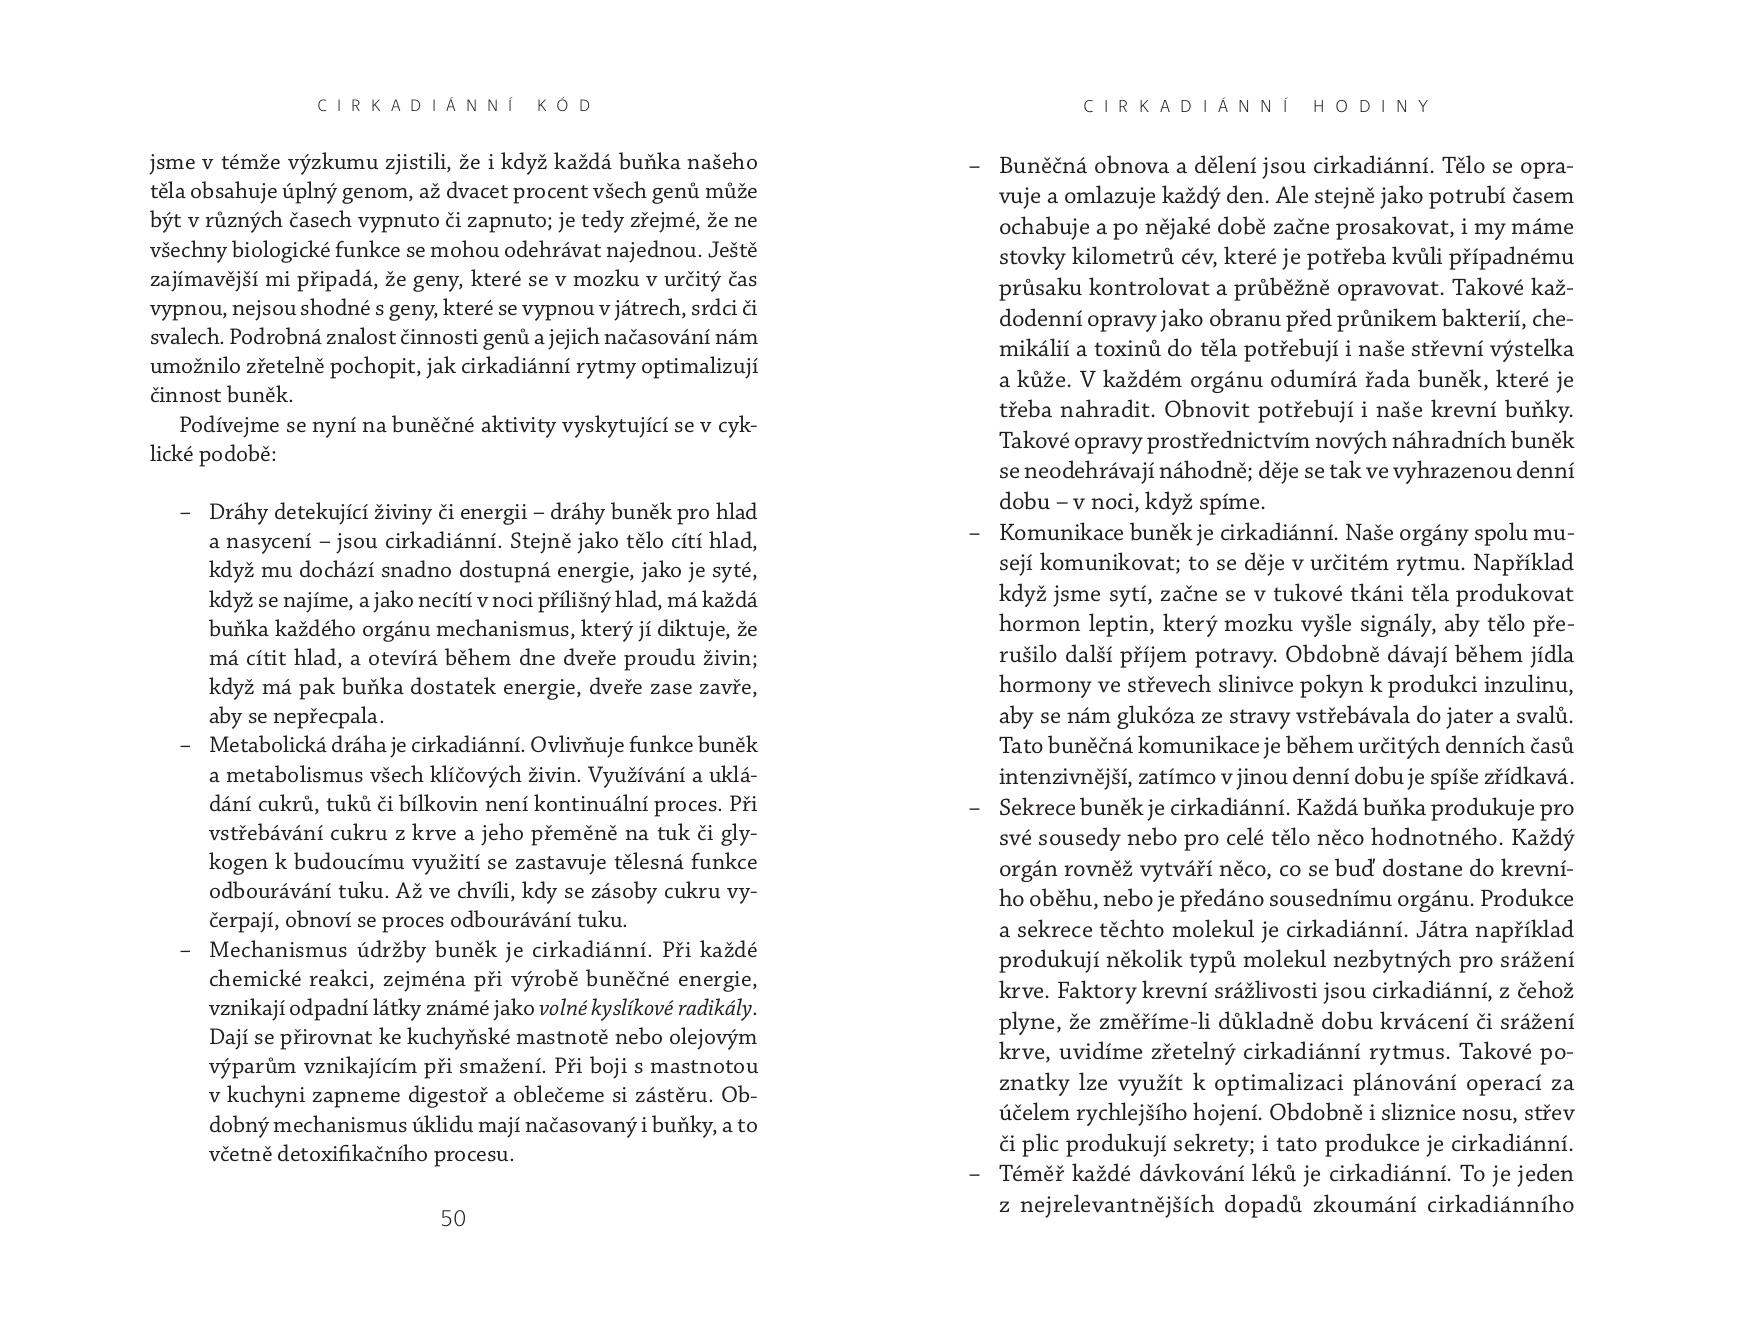 Cirkadianni Kod The Circadian Code Satchin Panda Jan Melvil Publishing